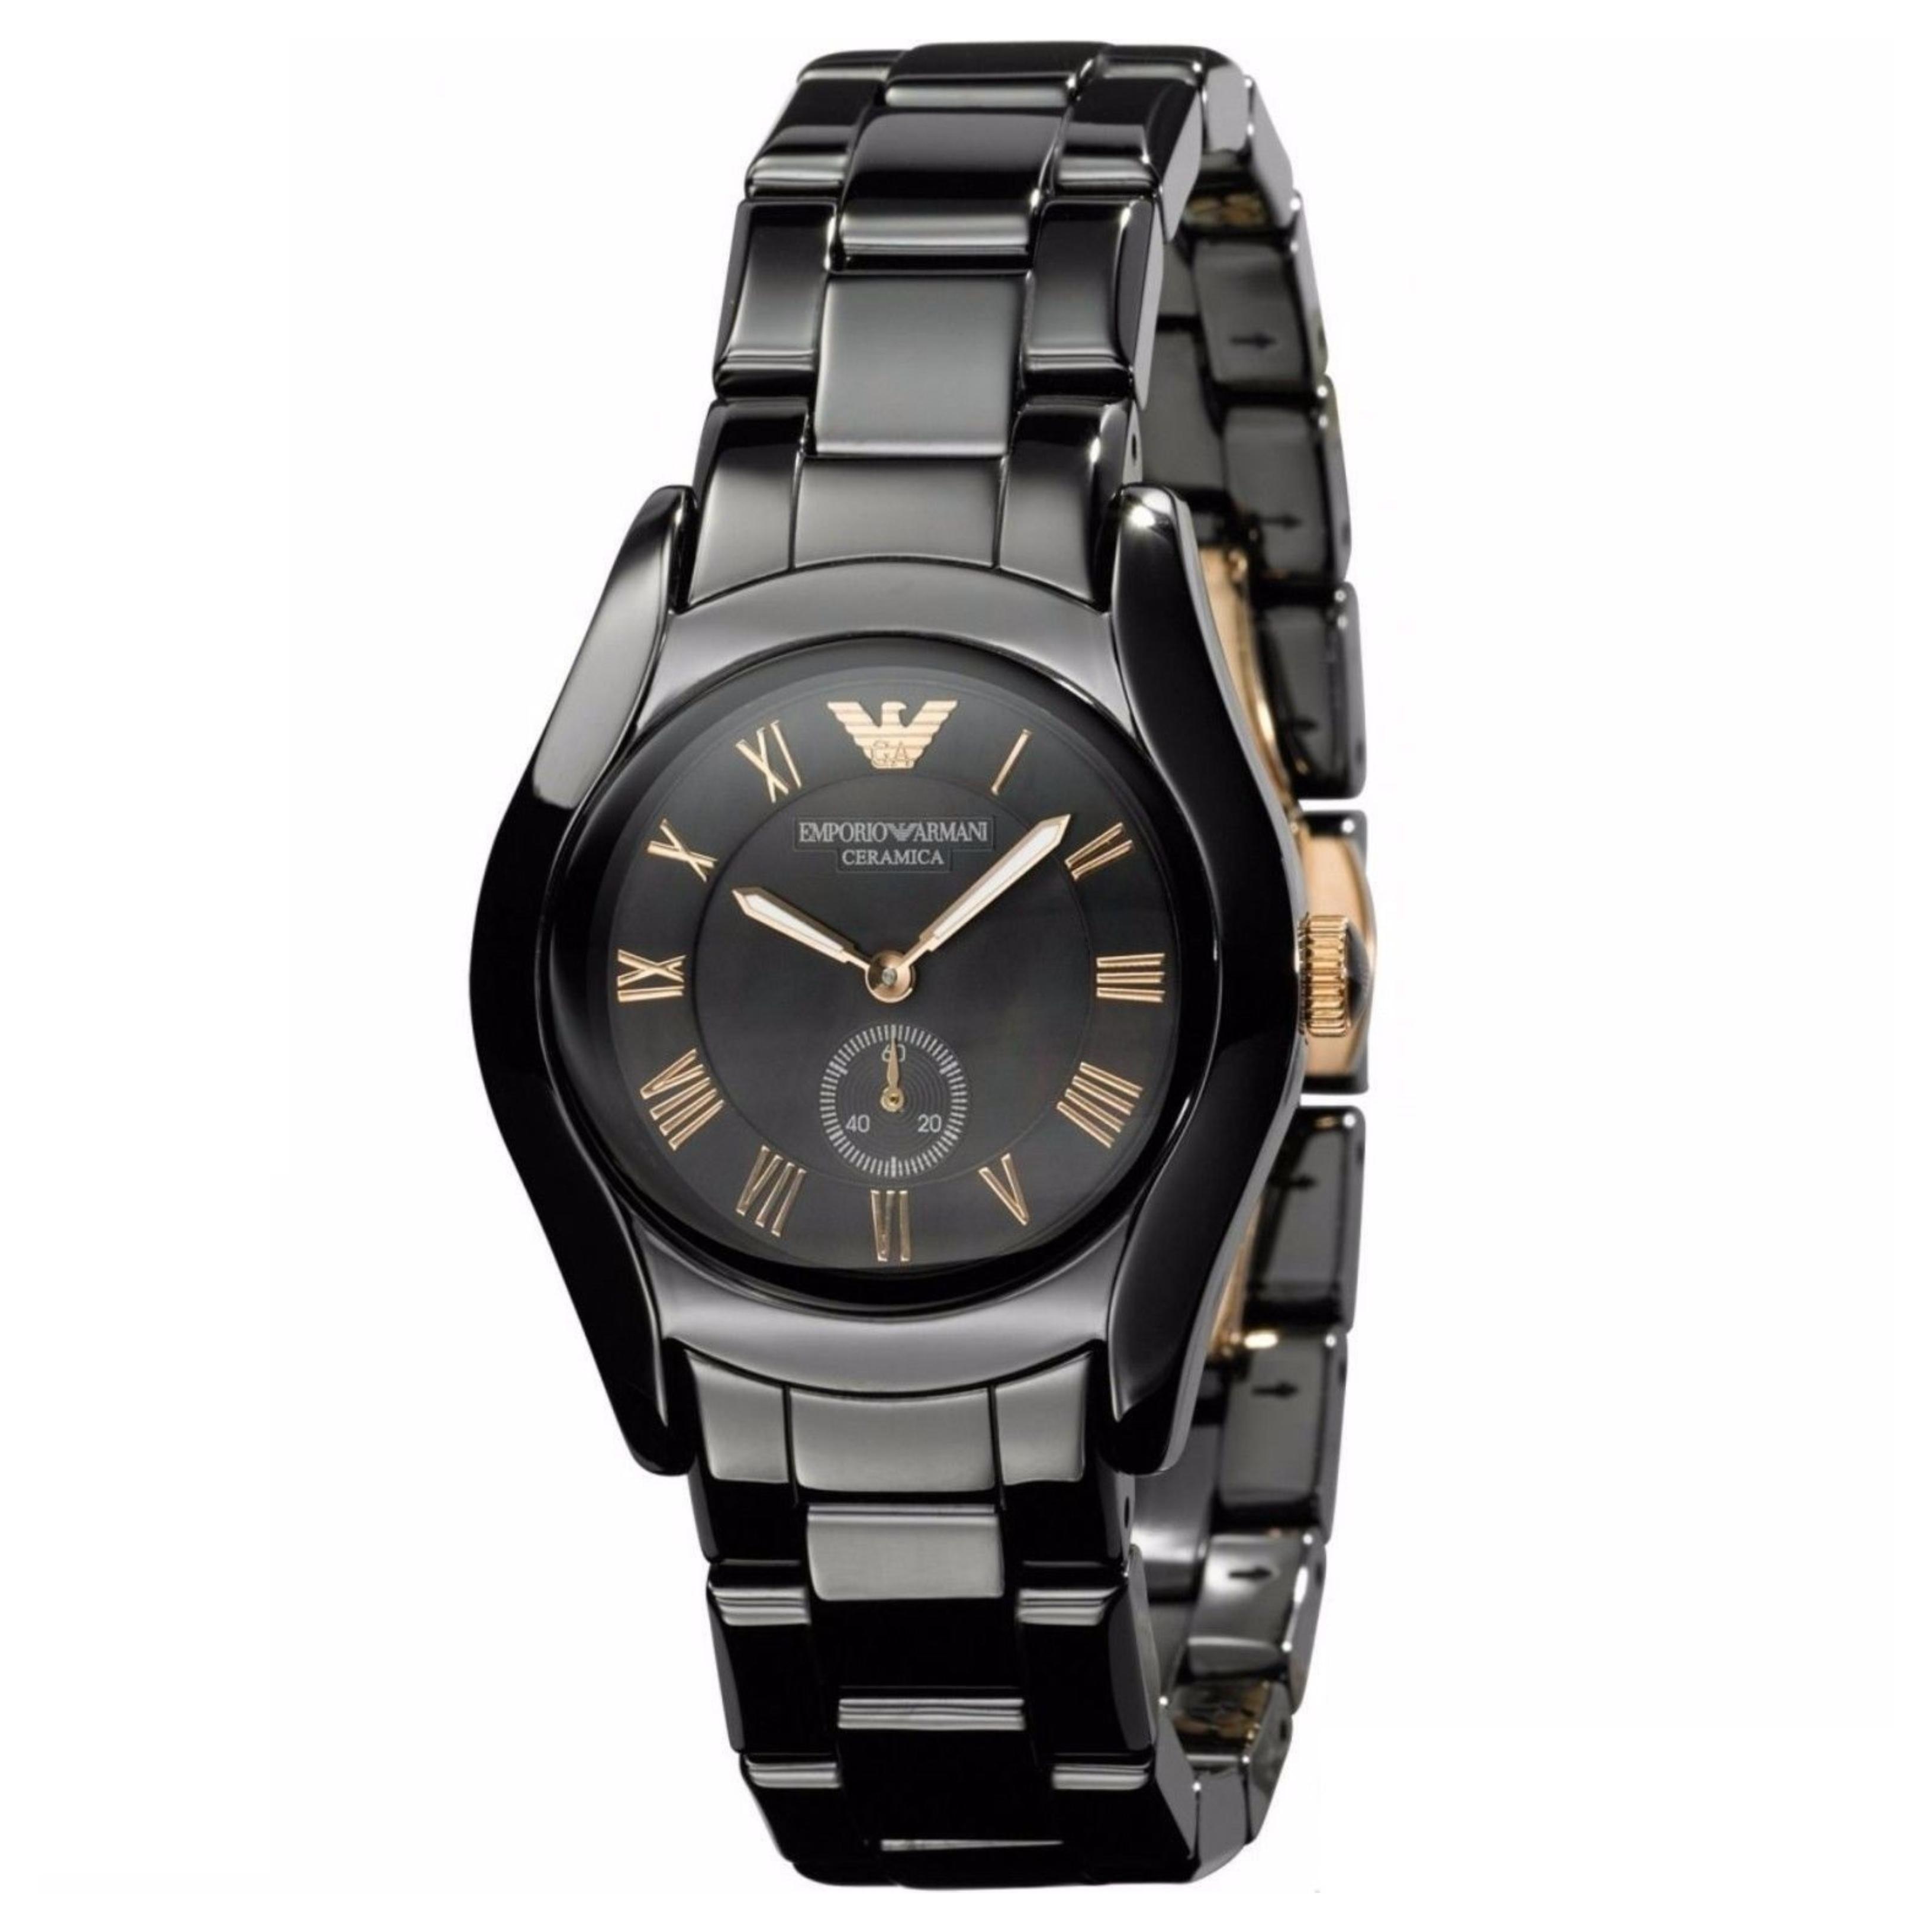 Emporio Armani Ceramic Slim Ladies Watch | Roman Numeral Black Dial & Strap | AR1412